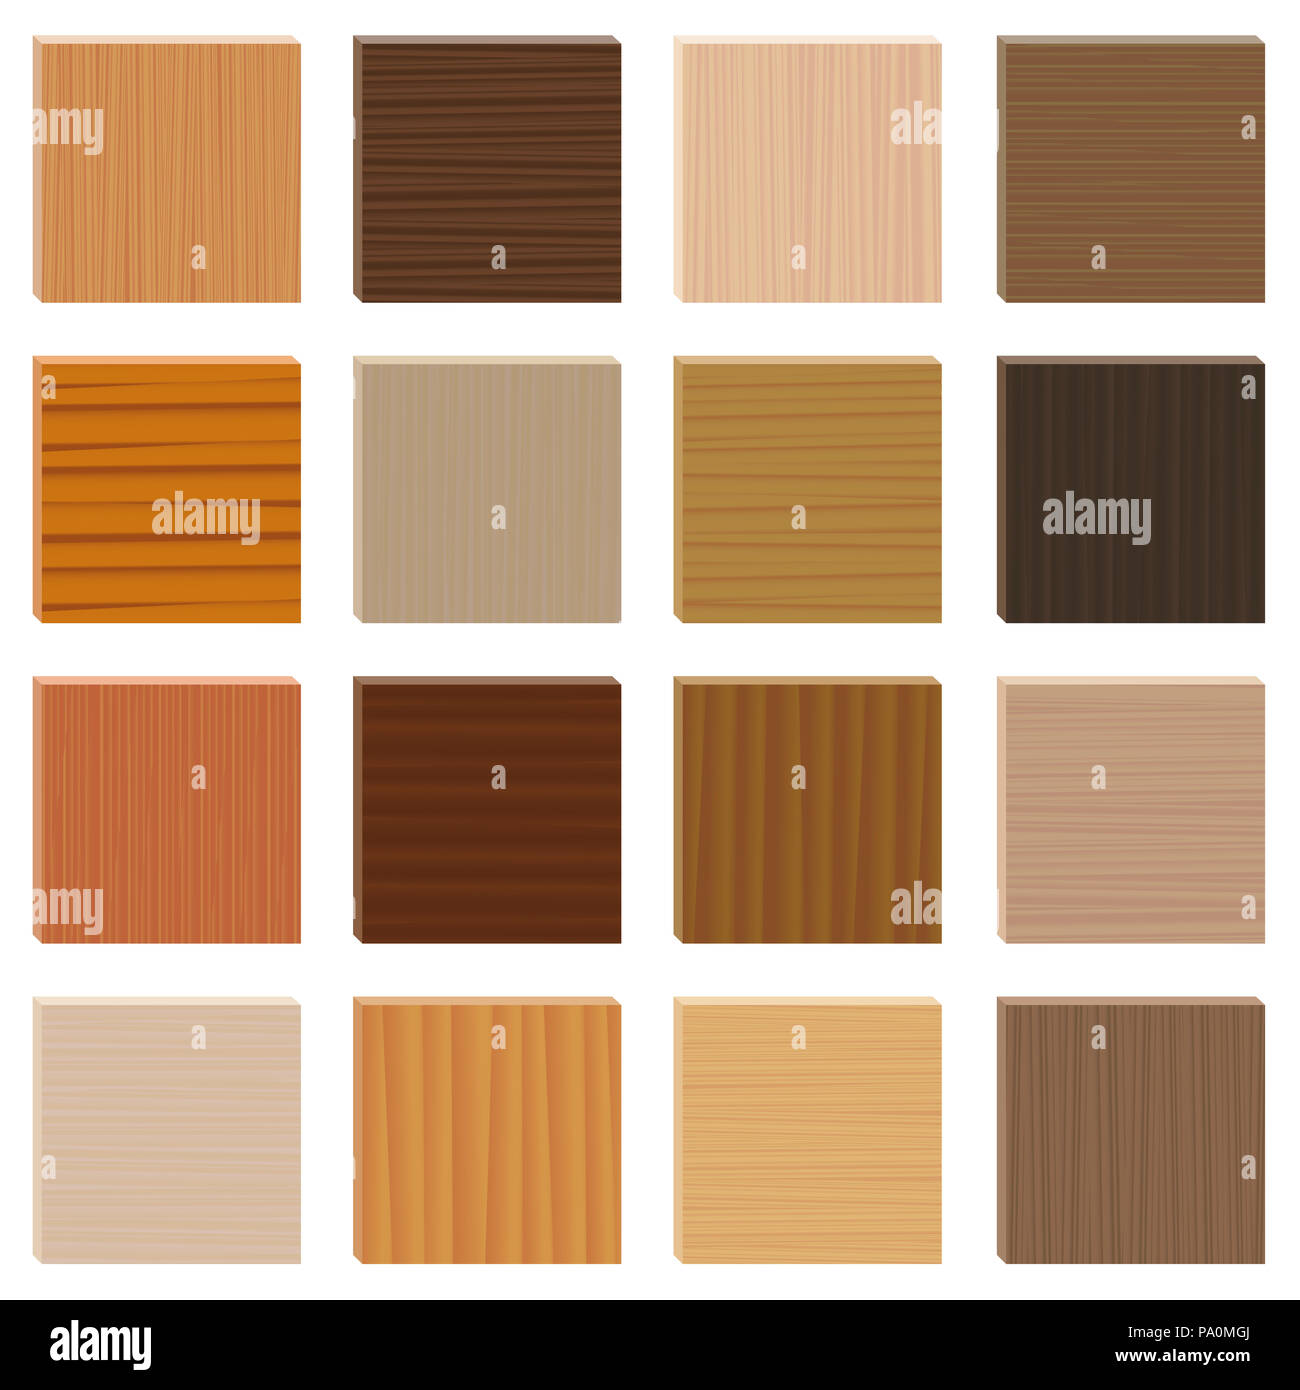 Berühmt Holz Proben. Sortierte Parkett Arten gesetzt. Holz- platten mit ZW17